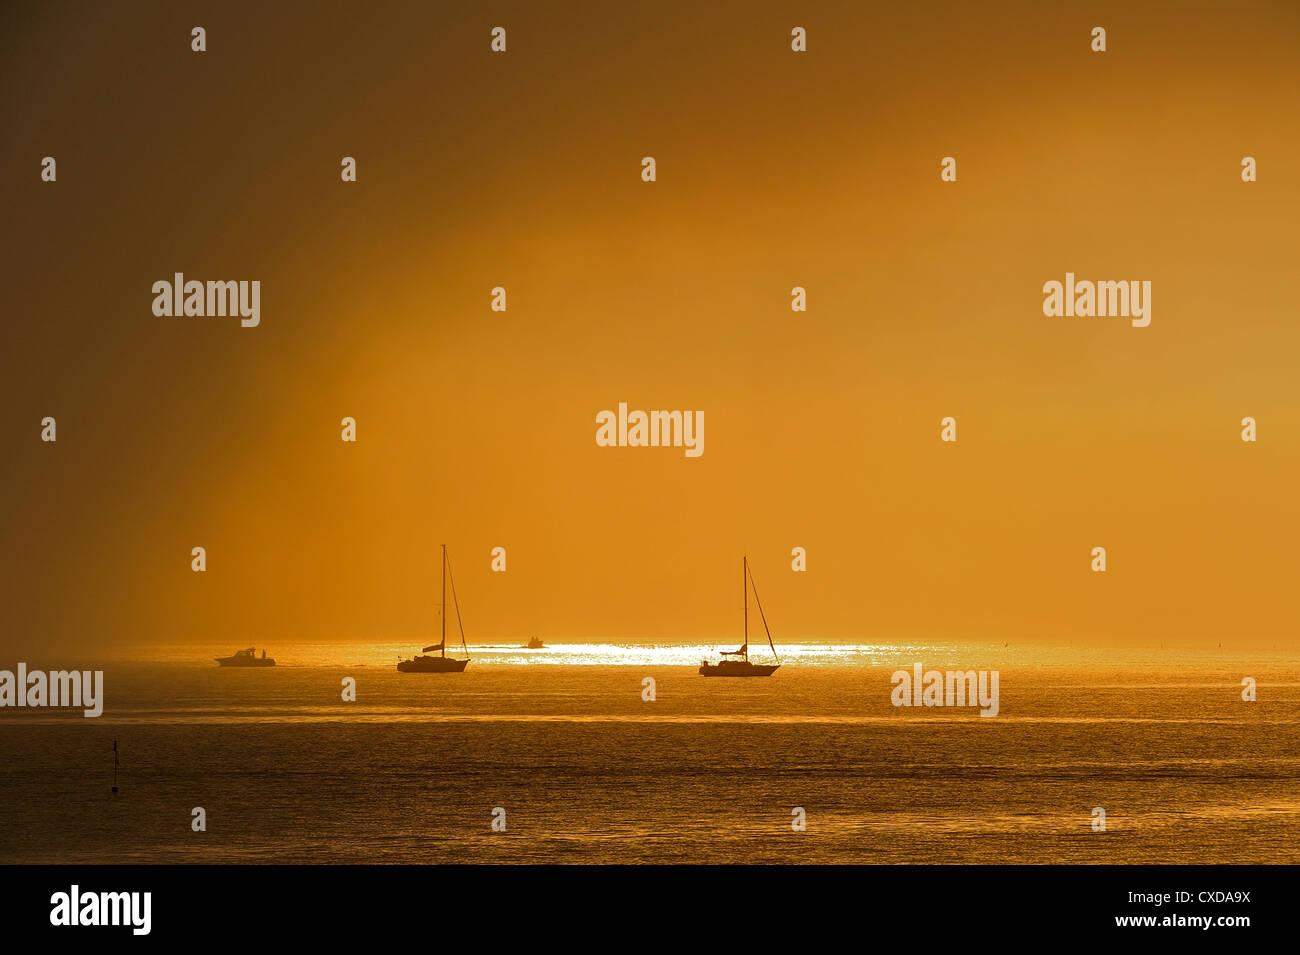 Rain cloud passing over sailing boats at sunset at Saint-Denis-d'Oléron on the island Ile d'Oléron, - Stock Image